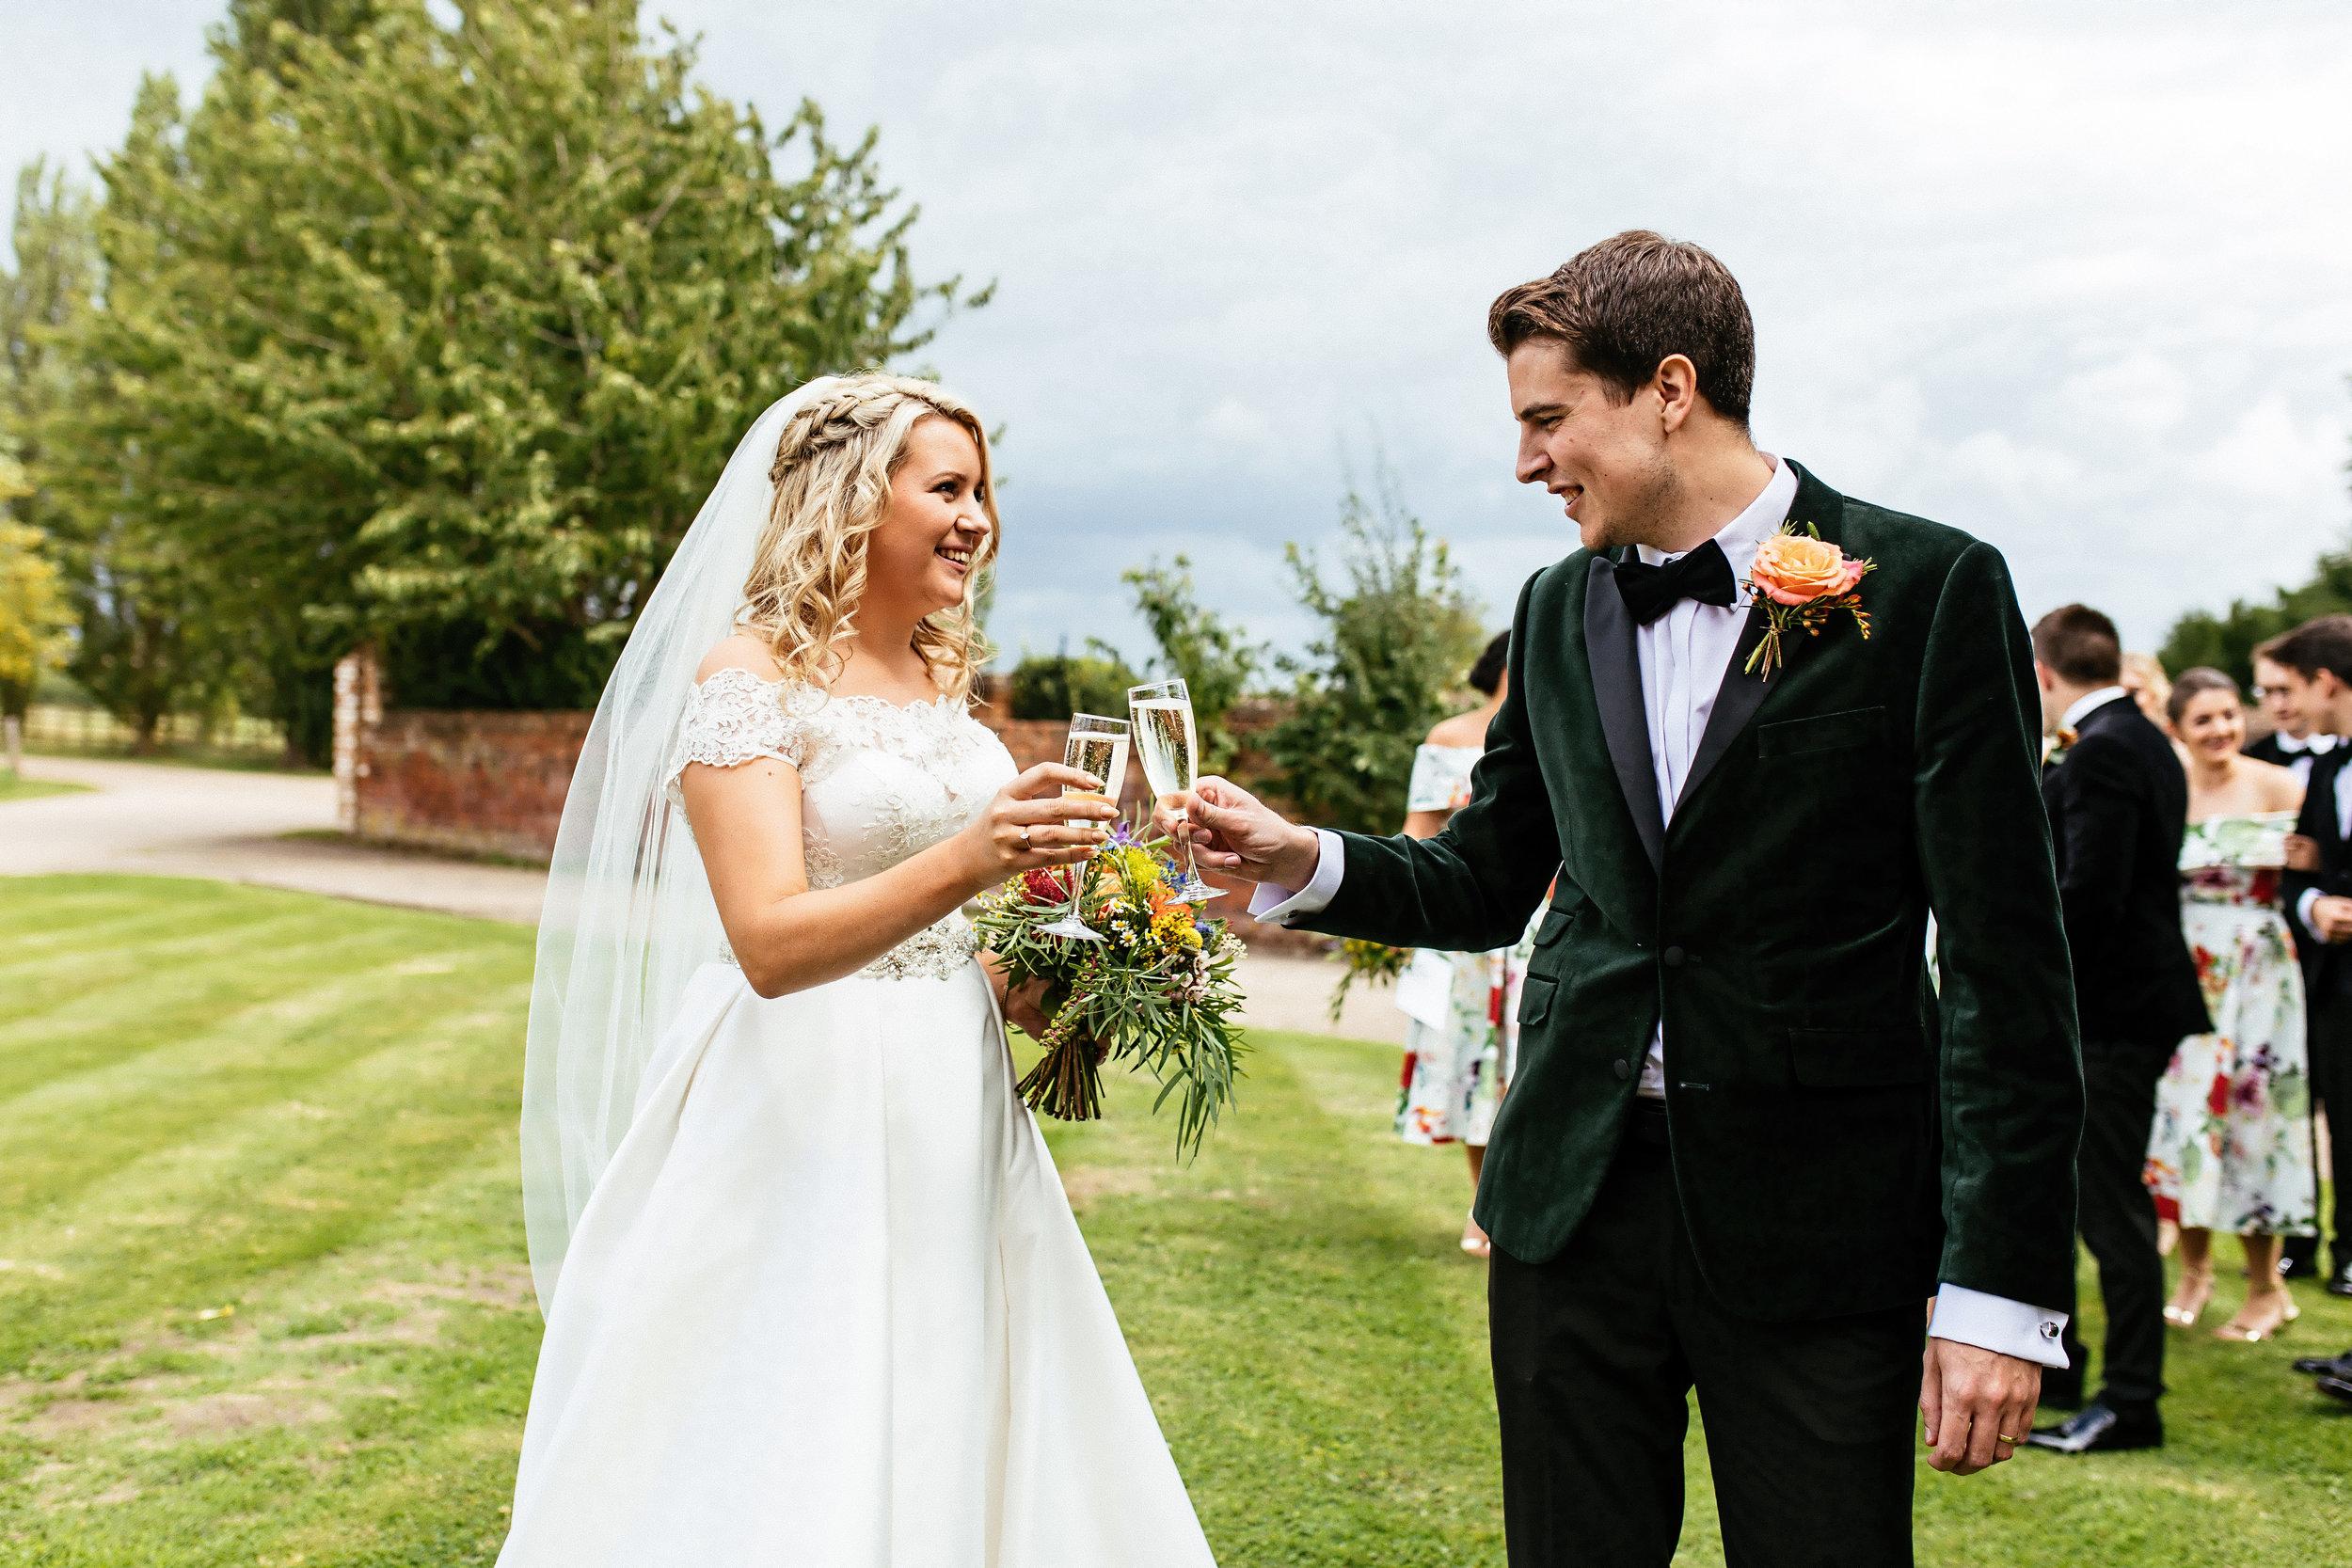 Tamara-and-Richard-Wedding-Highlights-30.jpg